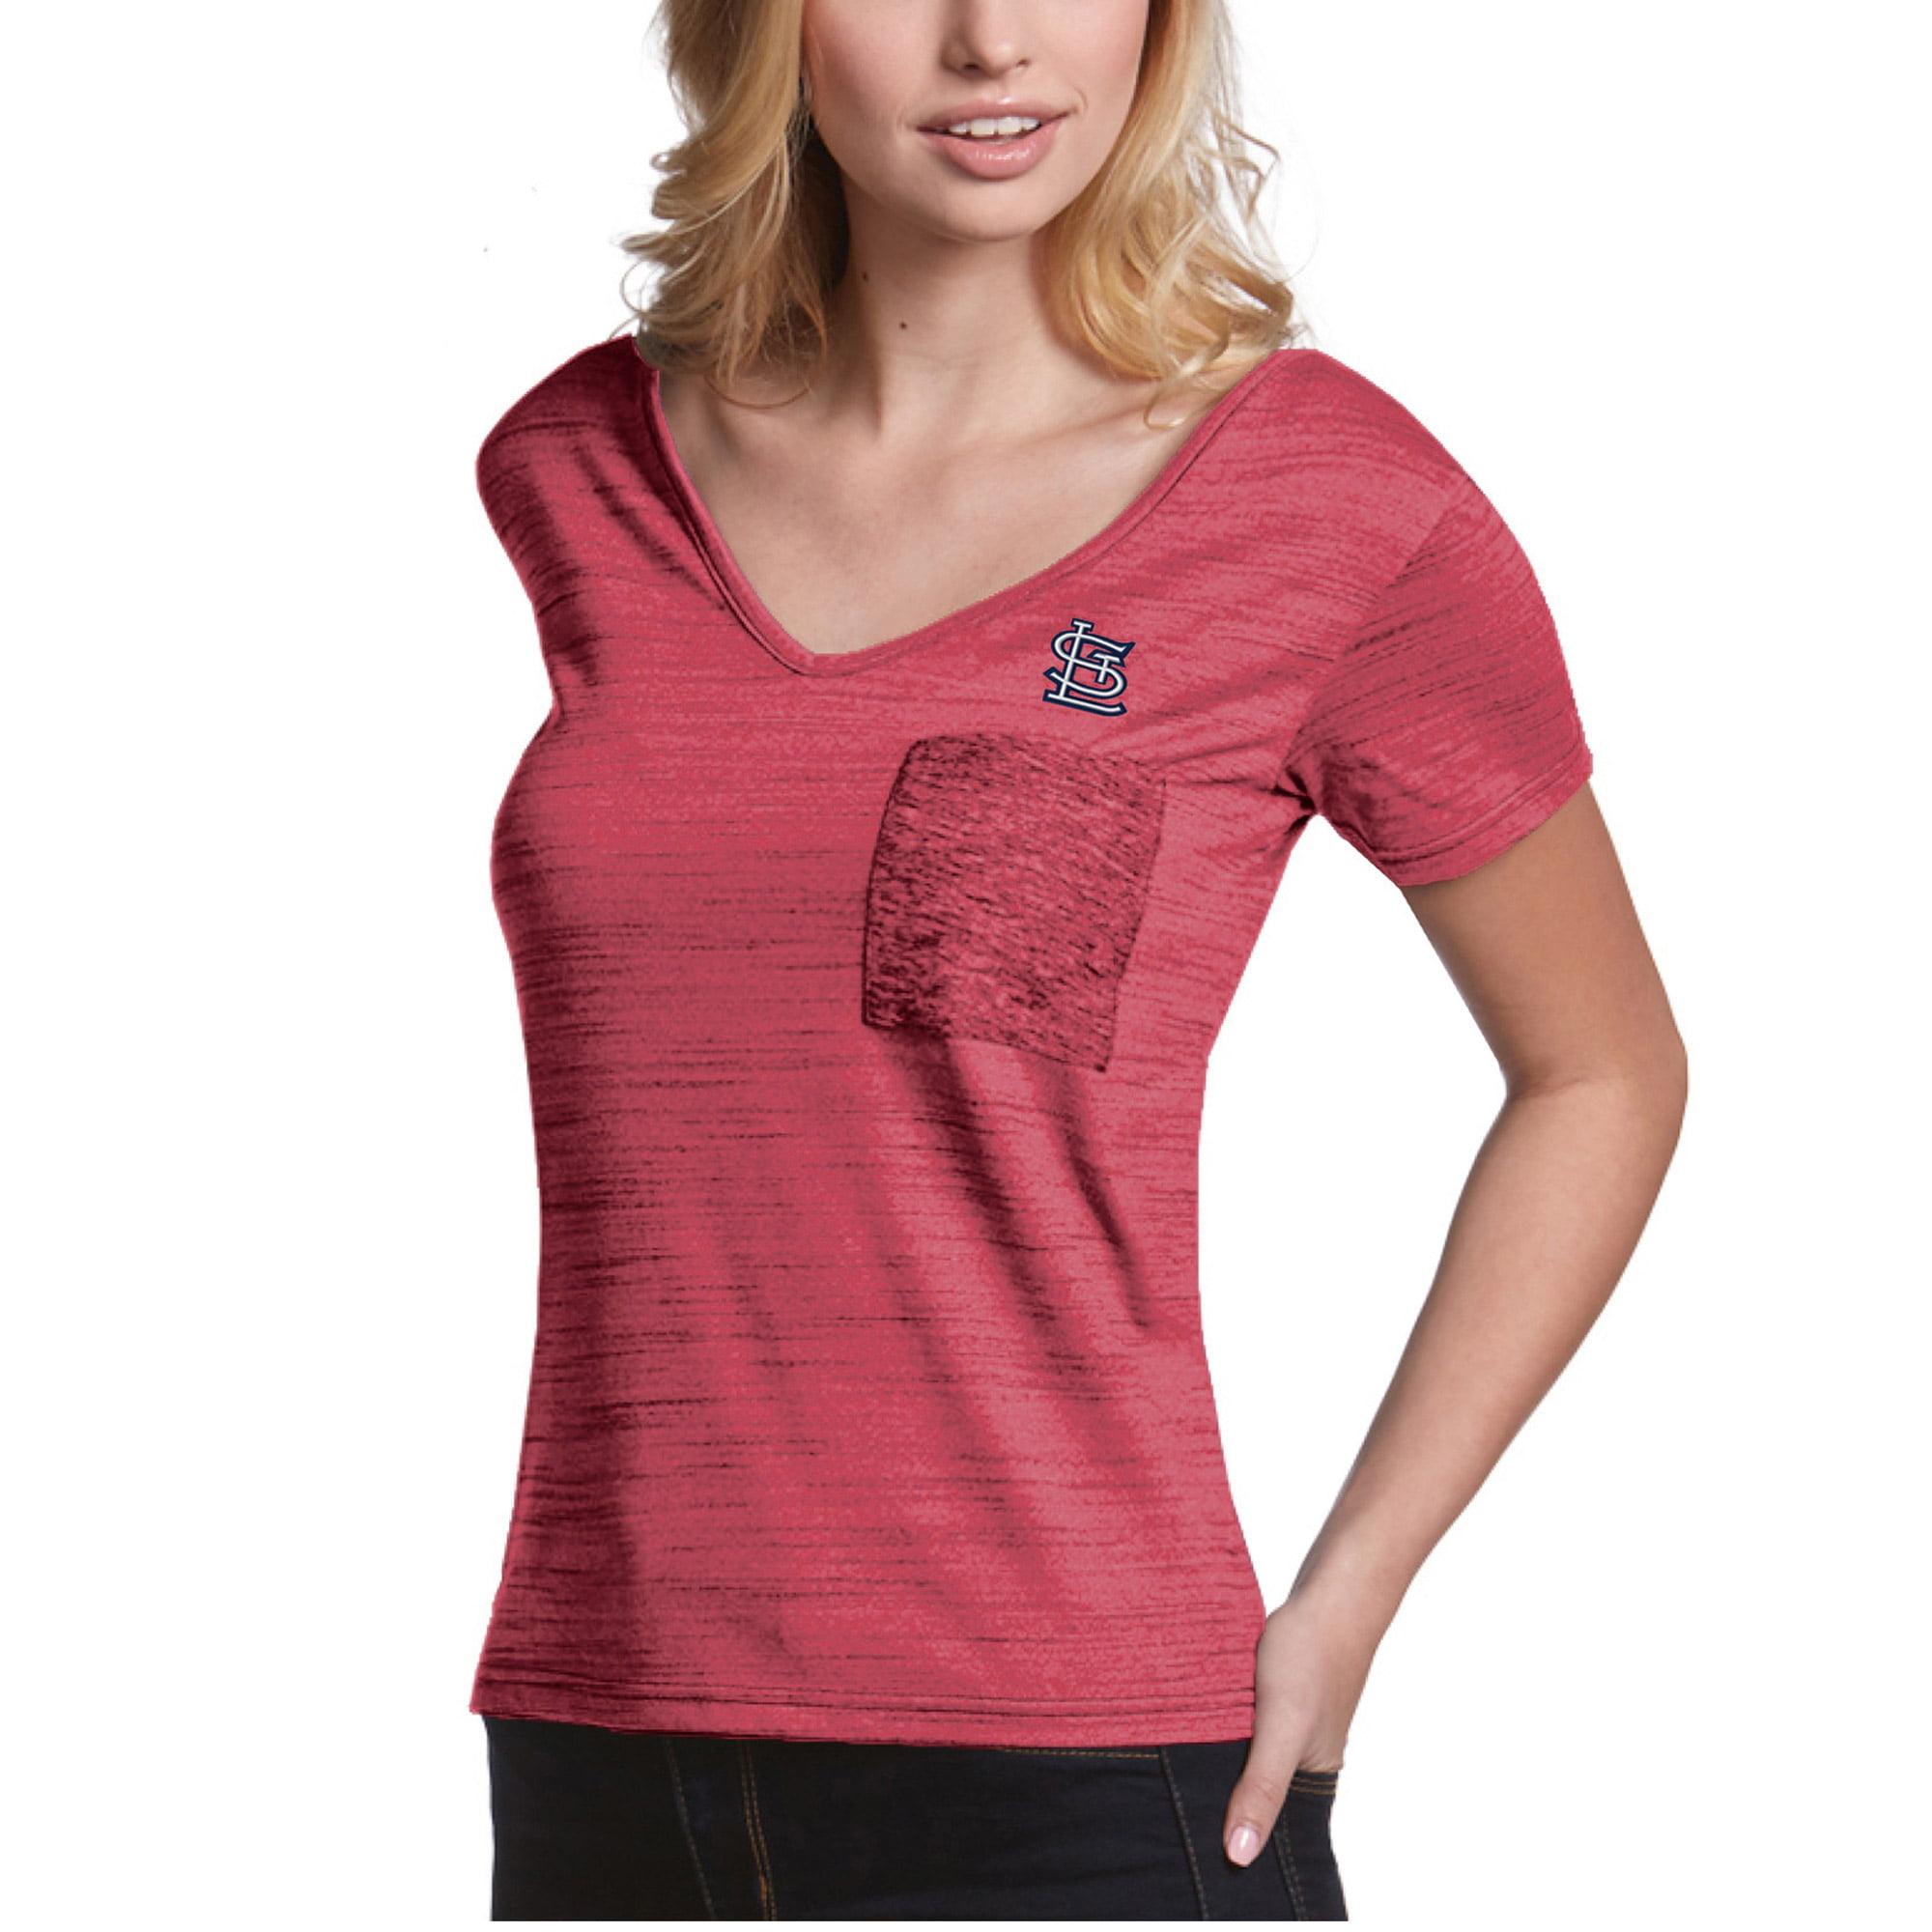 St. Louis Cardinals Antigua Women's Form Pocket T-Shirt - Red